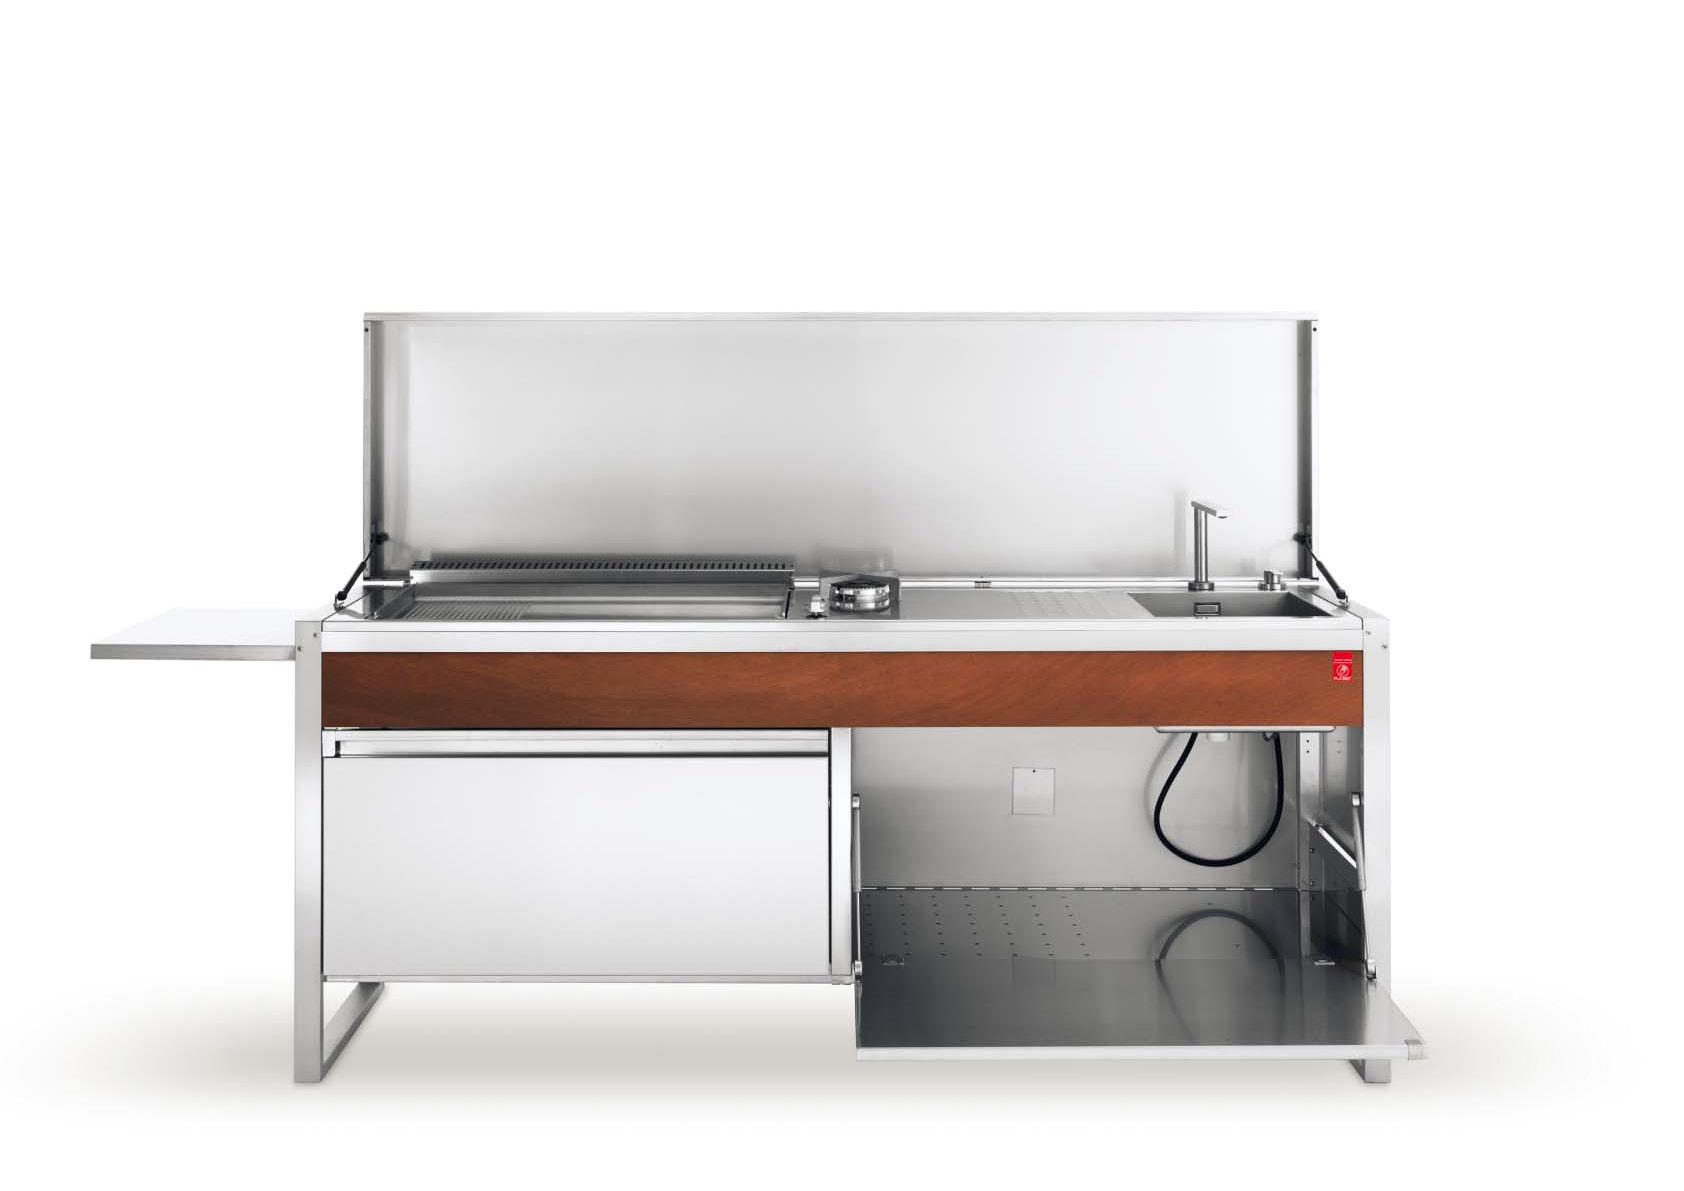 OASI Serie Outdoorküche 205 - C5 T5 (IN 55 Combi L)